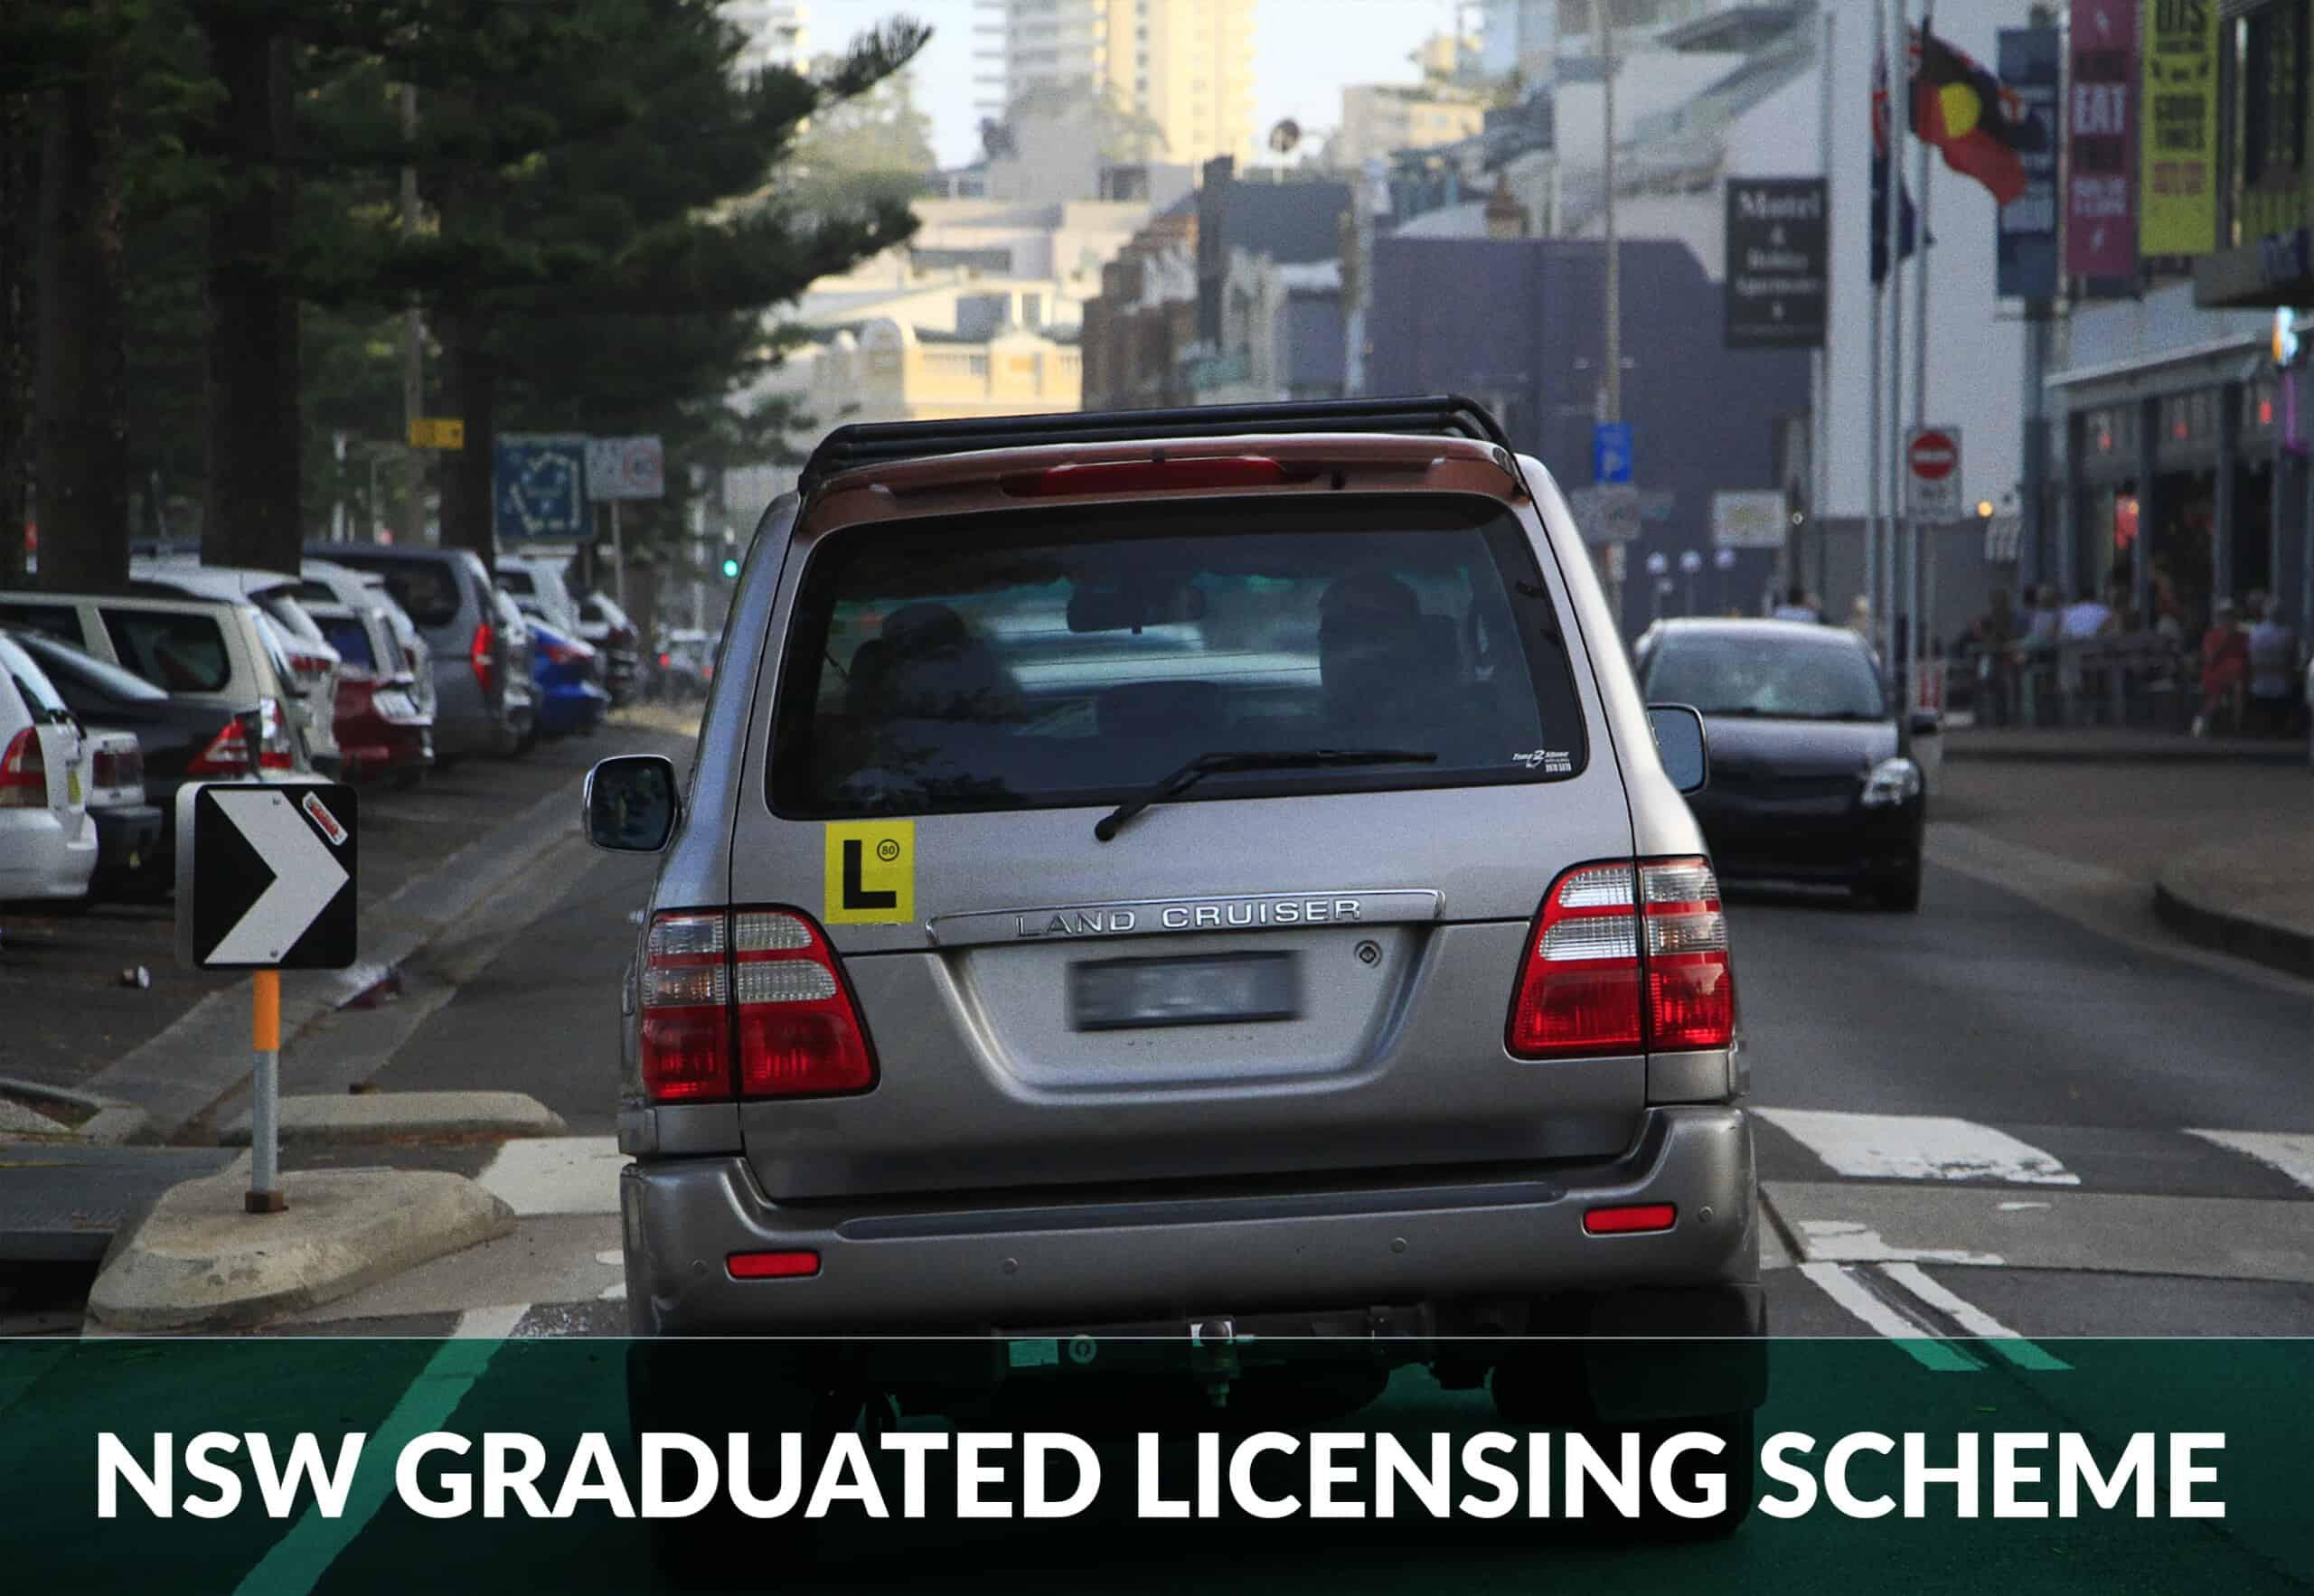 NSW graduated licensing scheme